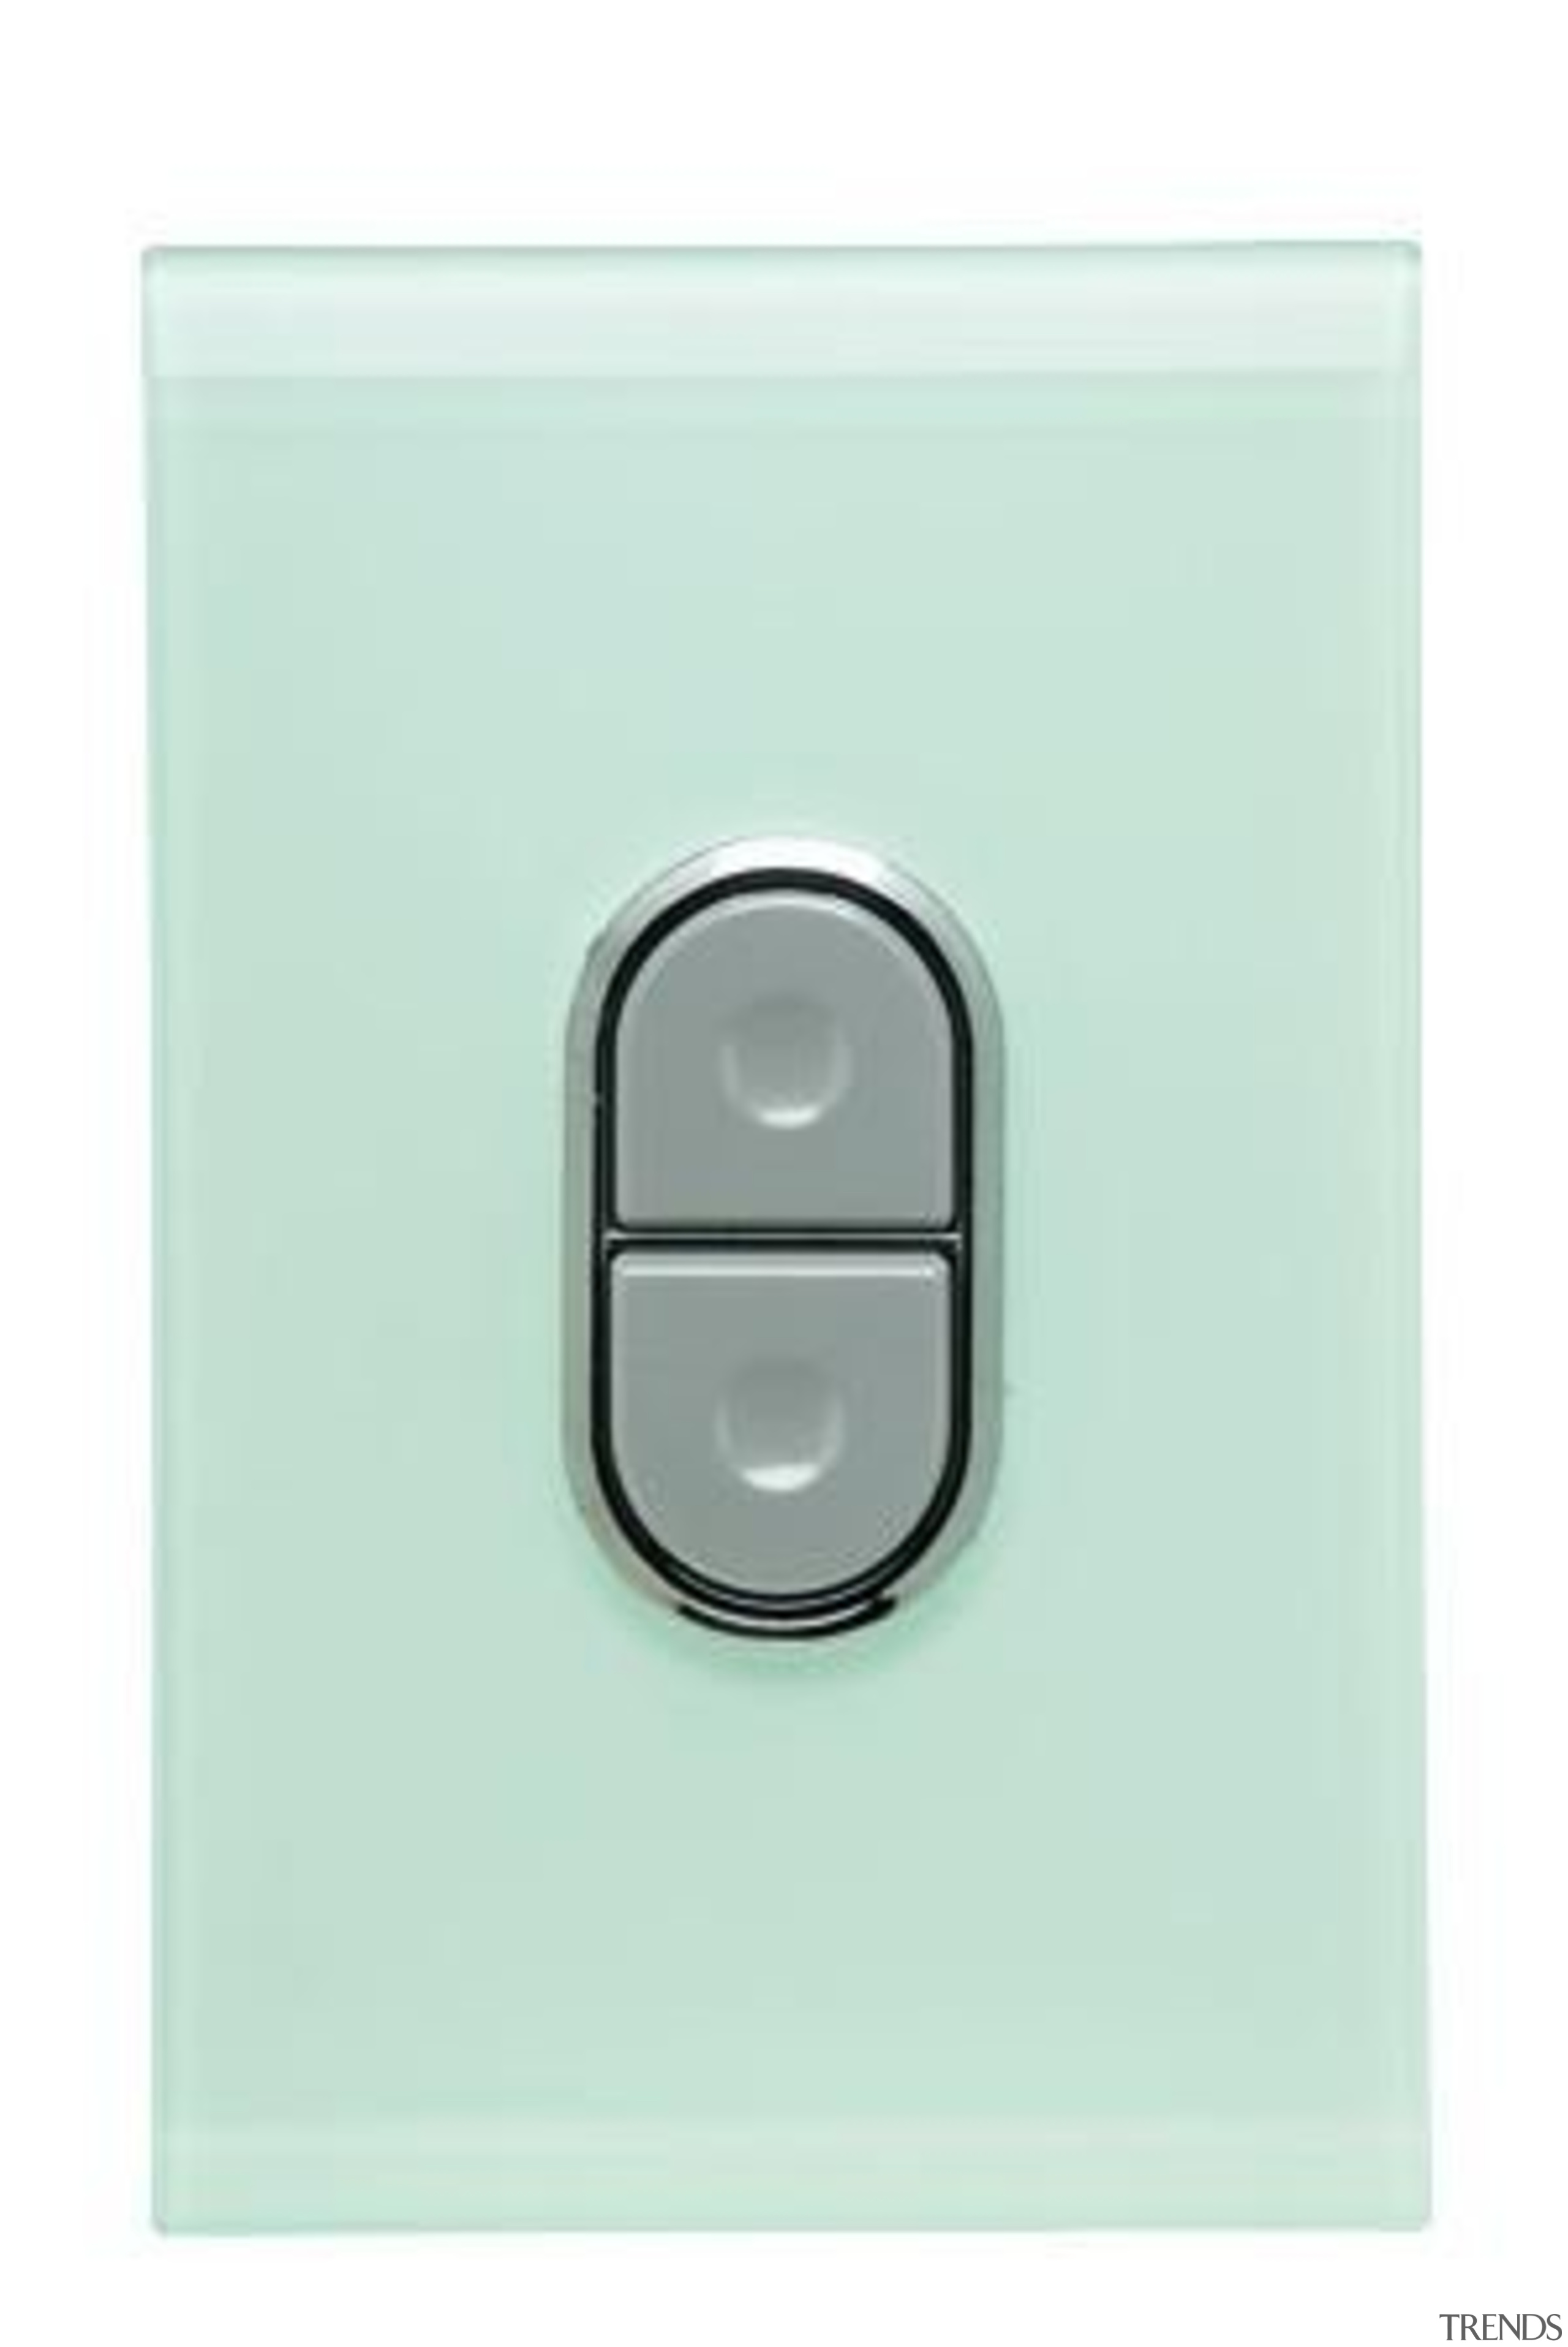 Saturn 250V range switch Ocean Mist - 406145-OM electronic device, light switch, switch, technology, white